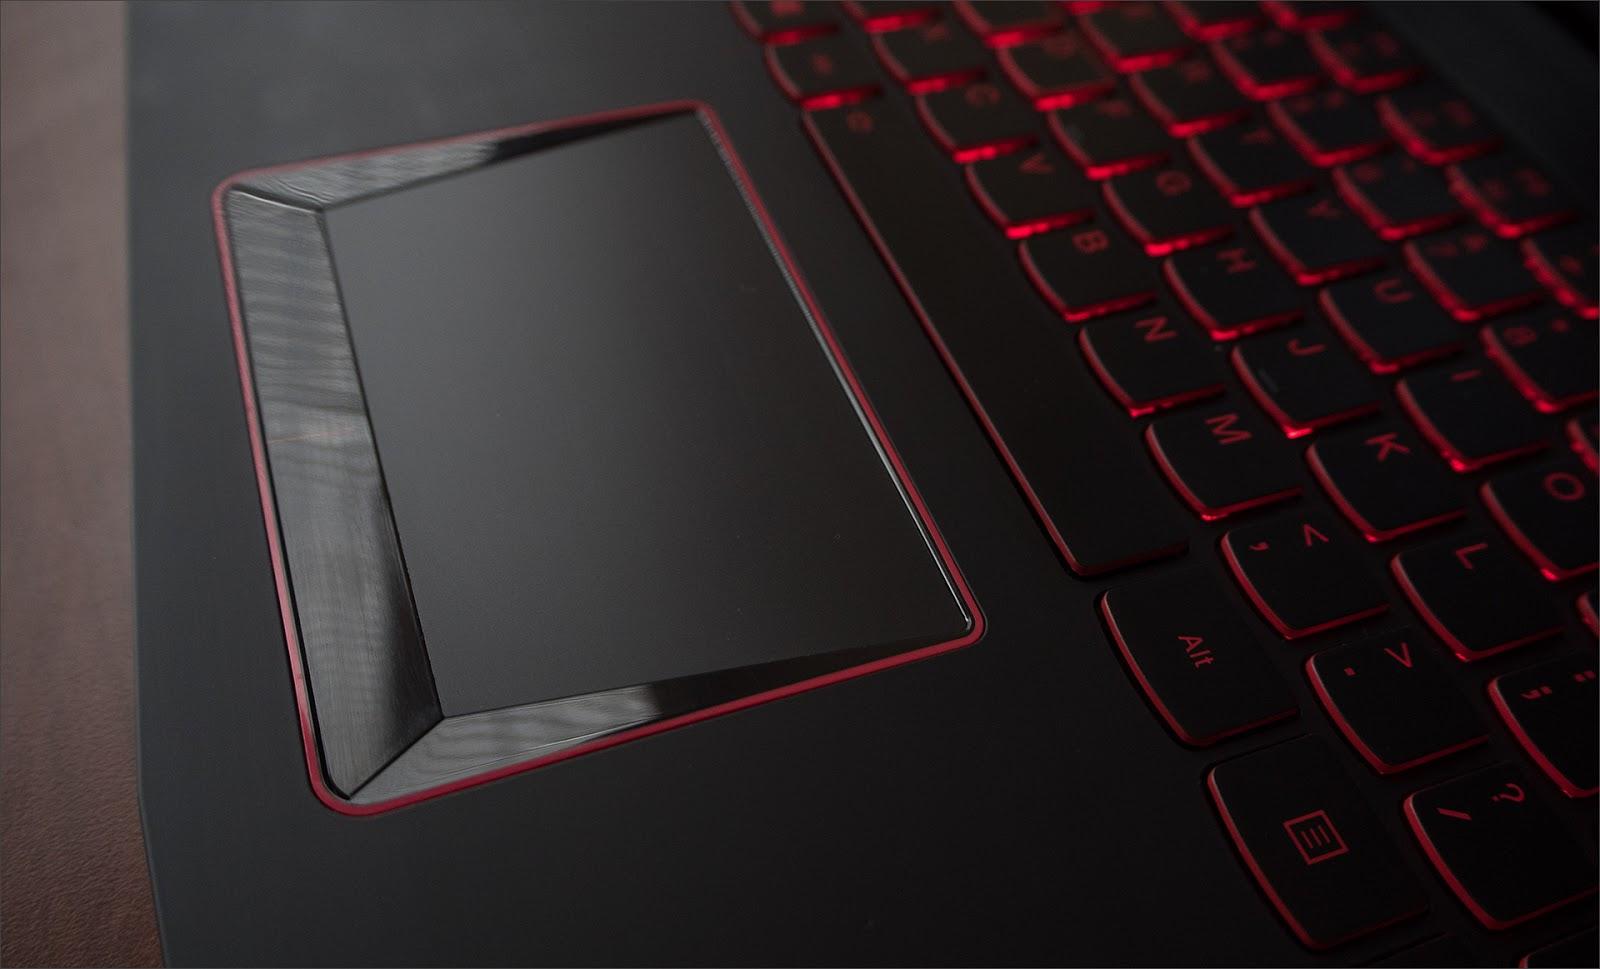 Балансируем на грани разумного с Lenovo Y520 - 10